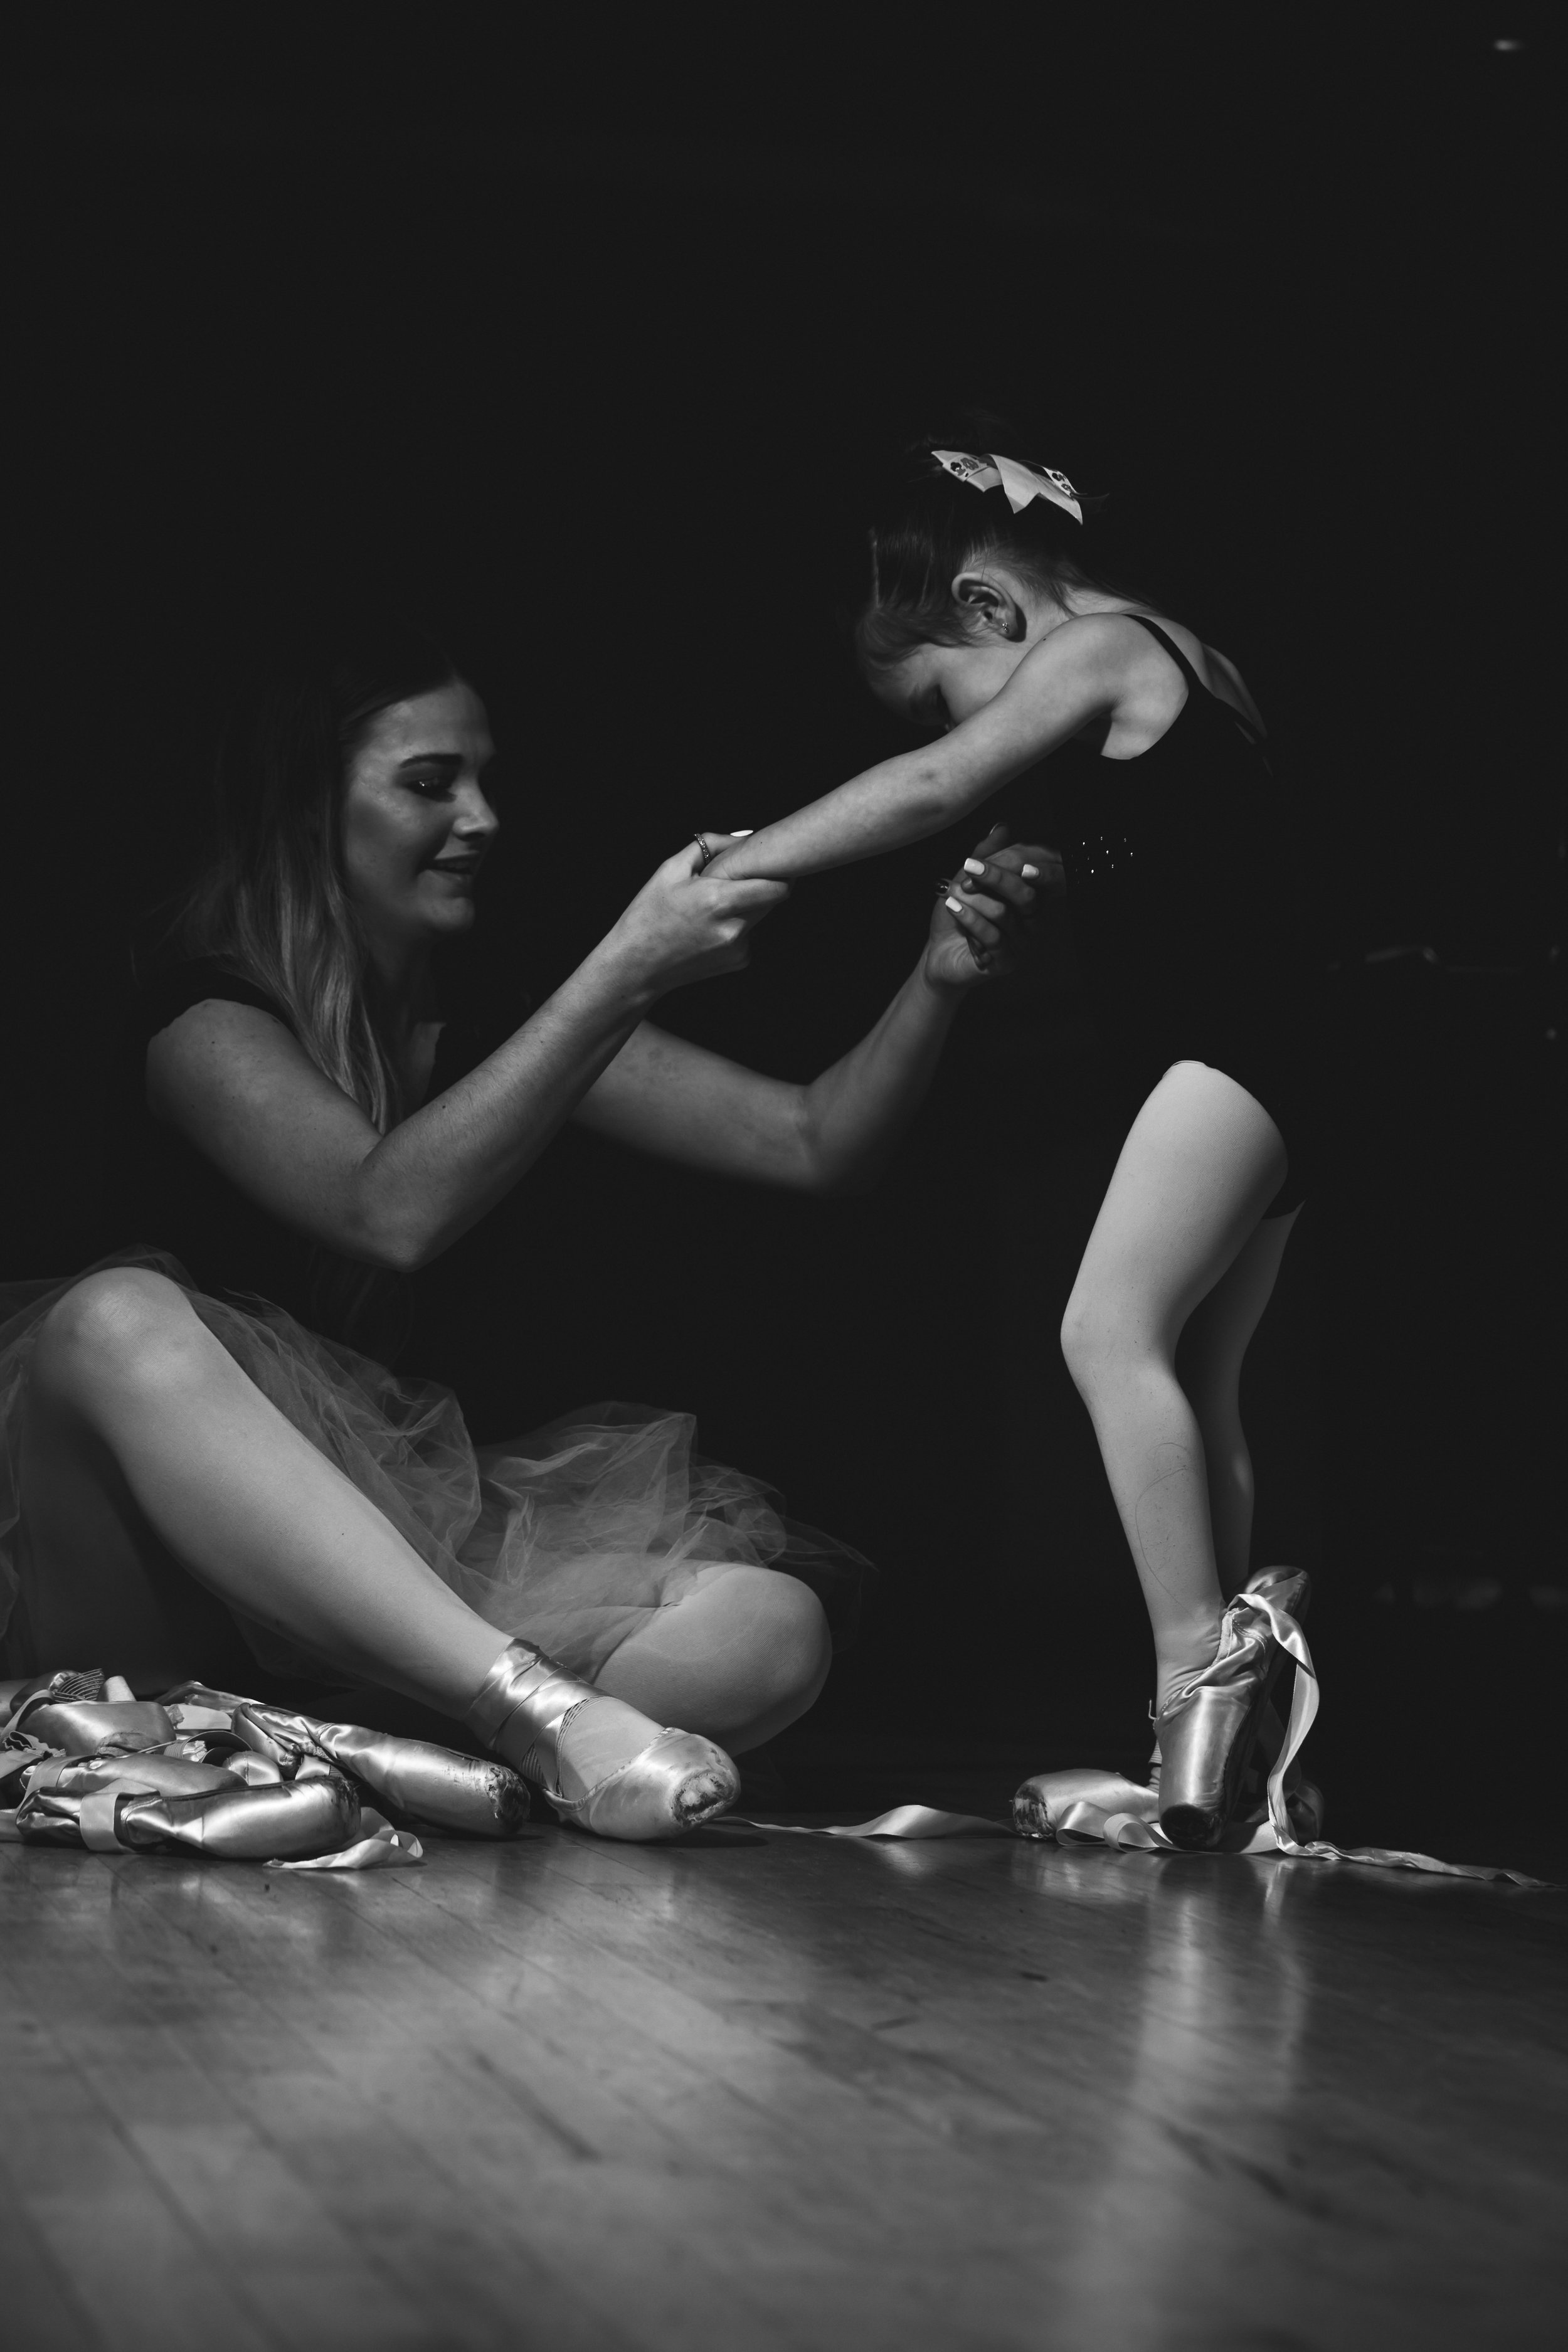 Enumclaw-ballet-photographer-49.jpg